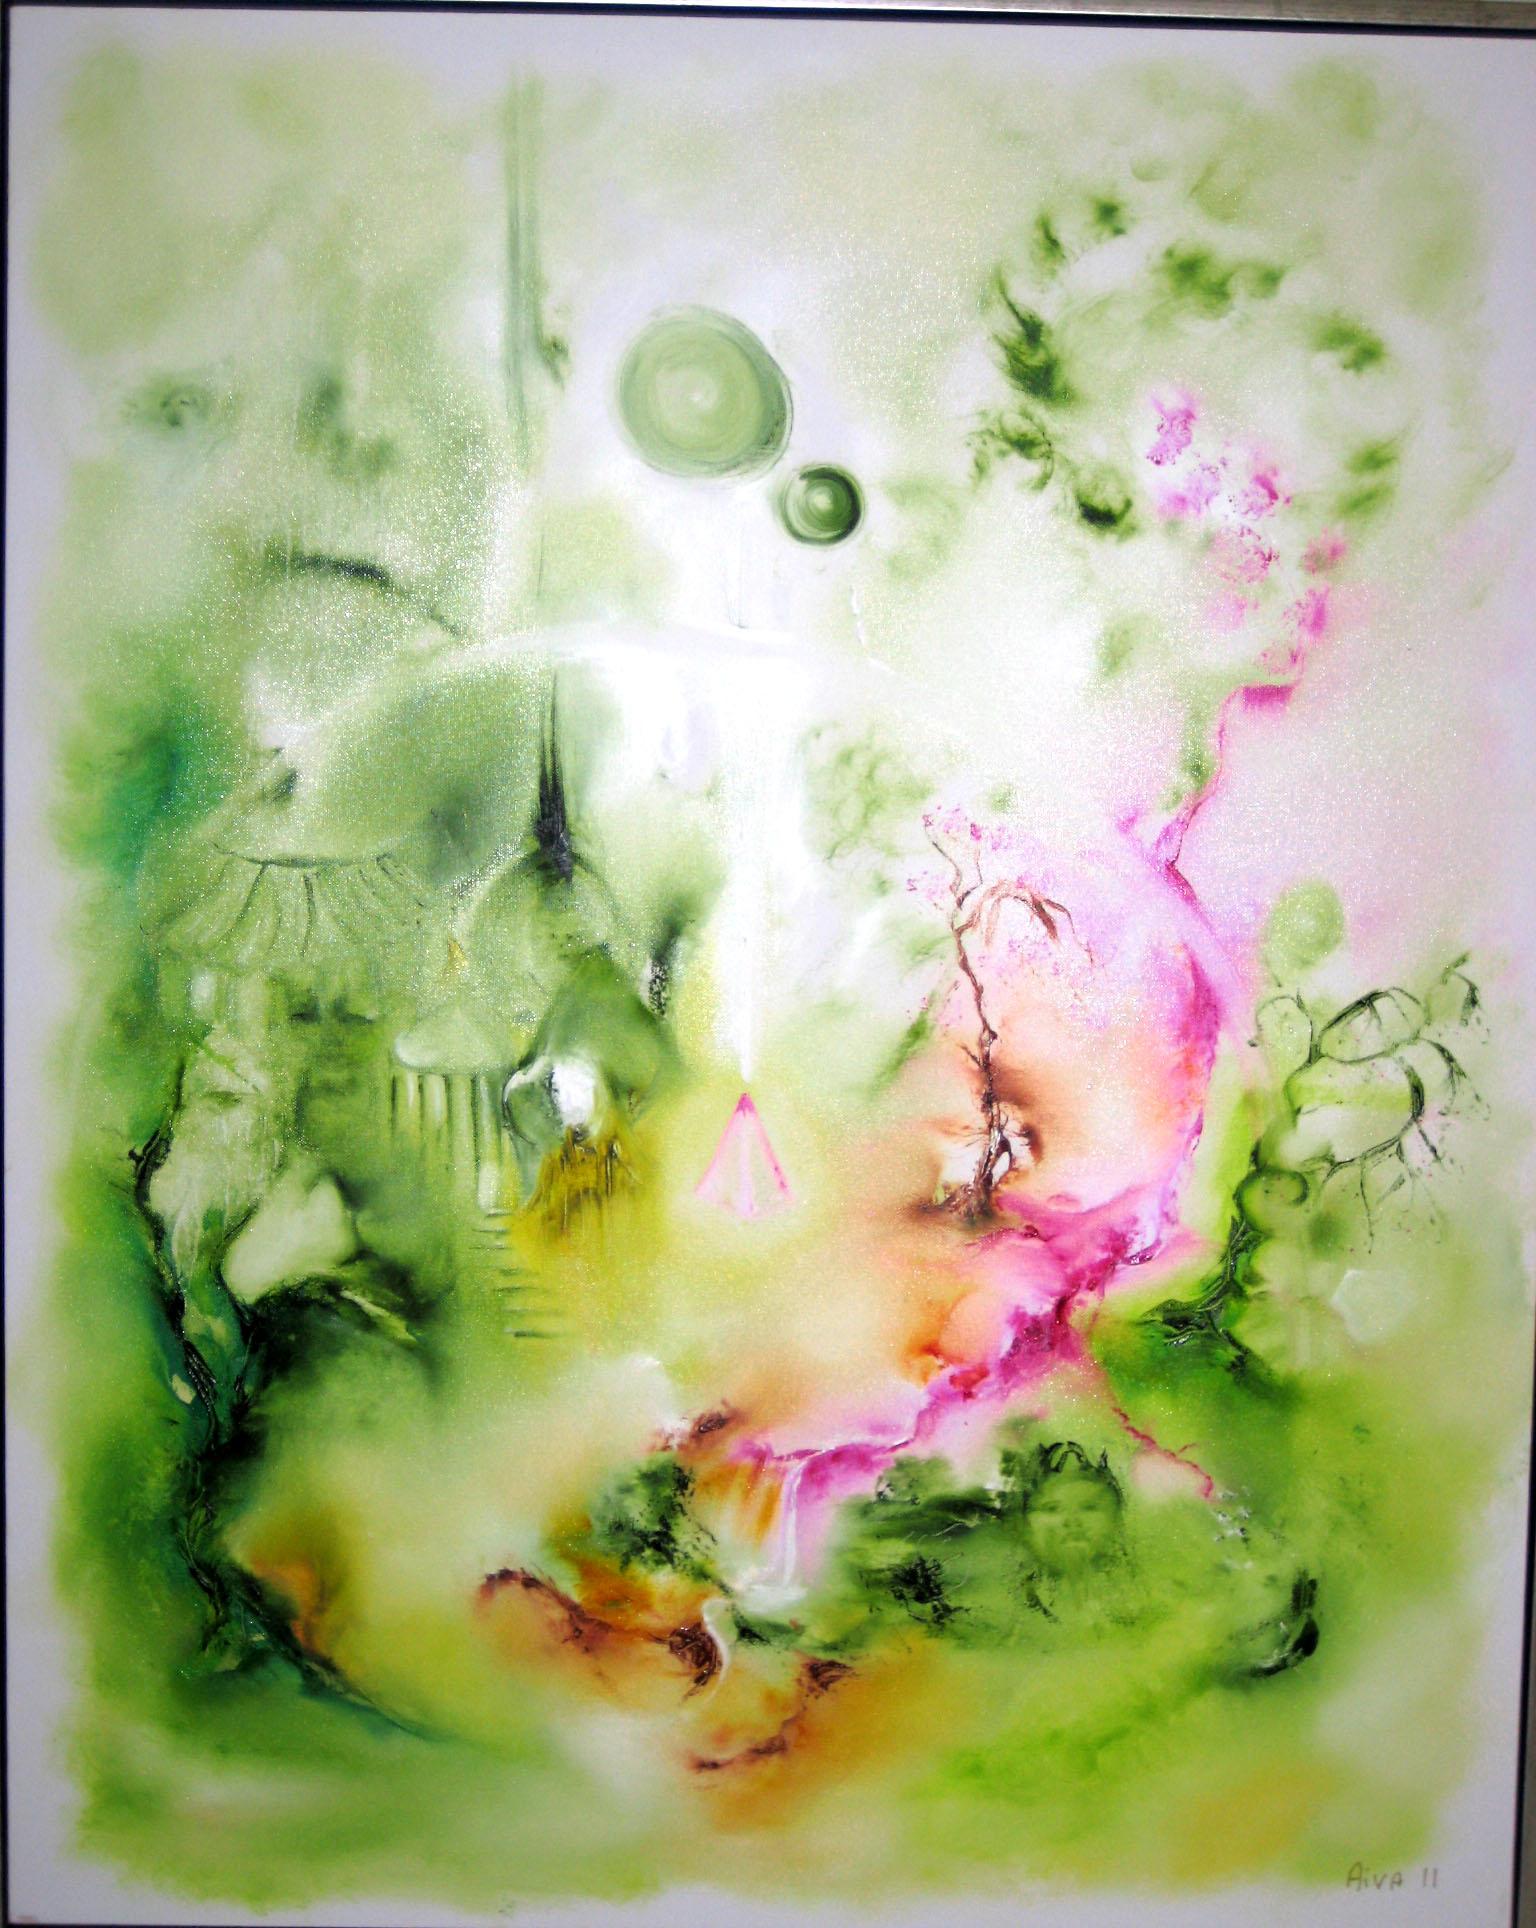 Sjælebillede-sjælsbillede-kanaliseret maleri-aiva-jacqueline.ostrowski